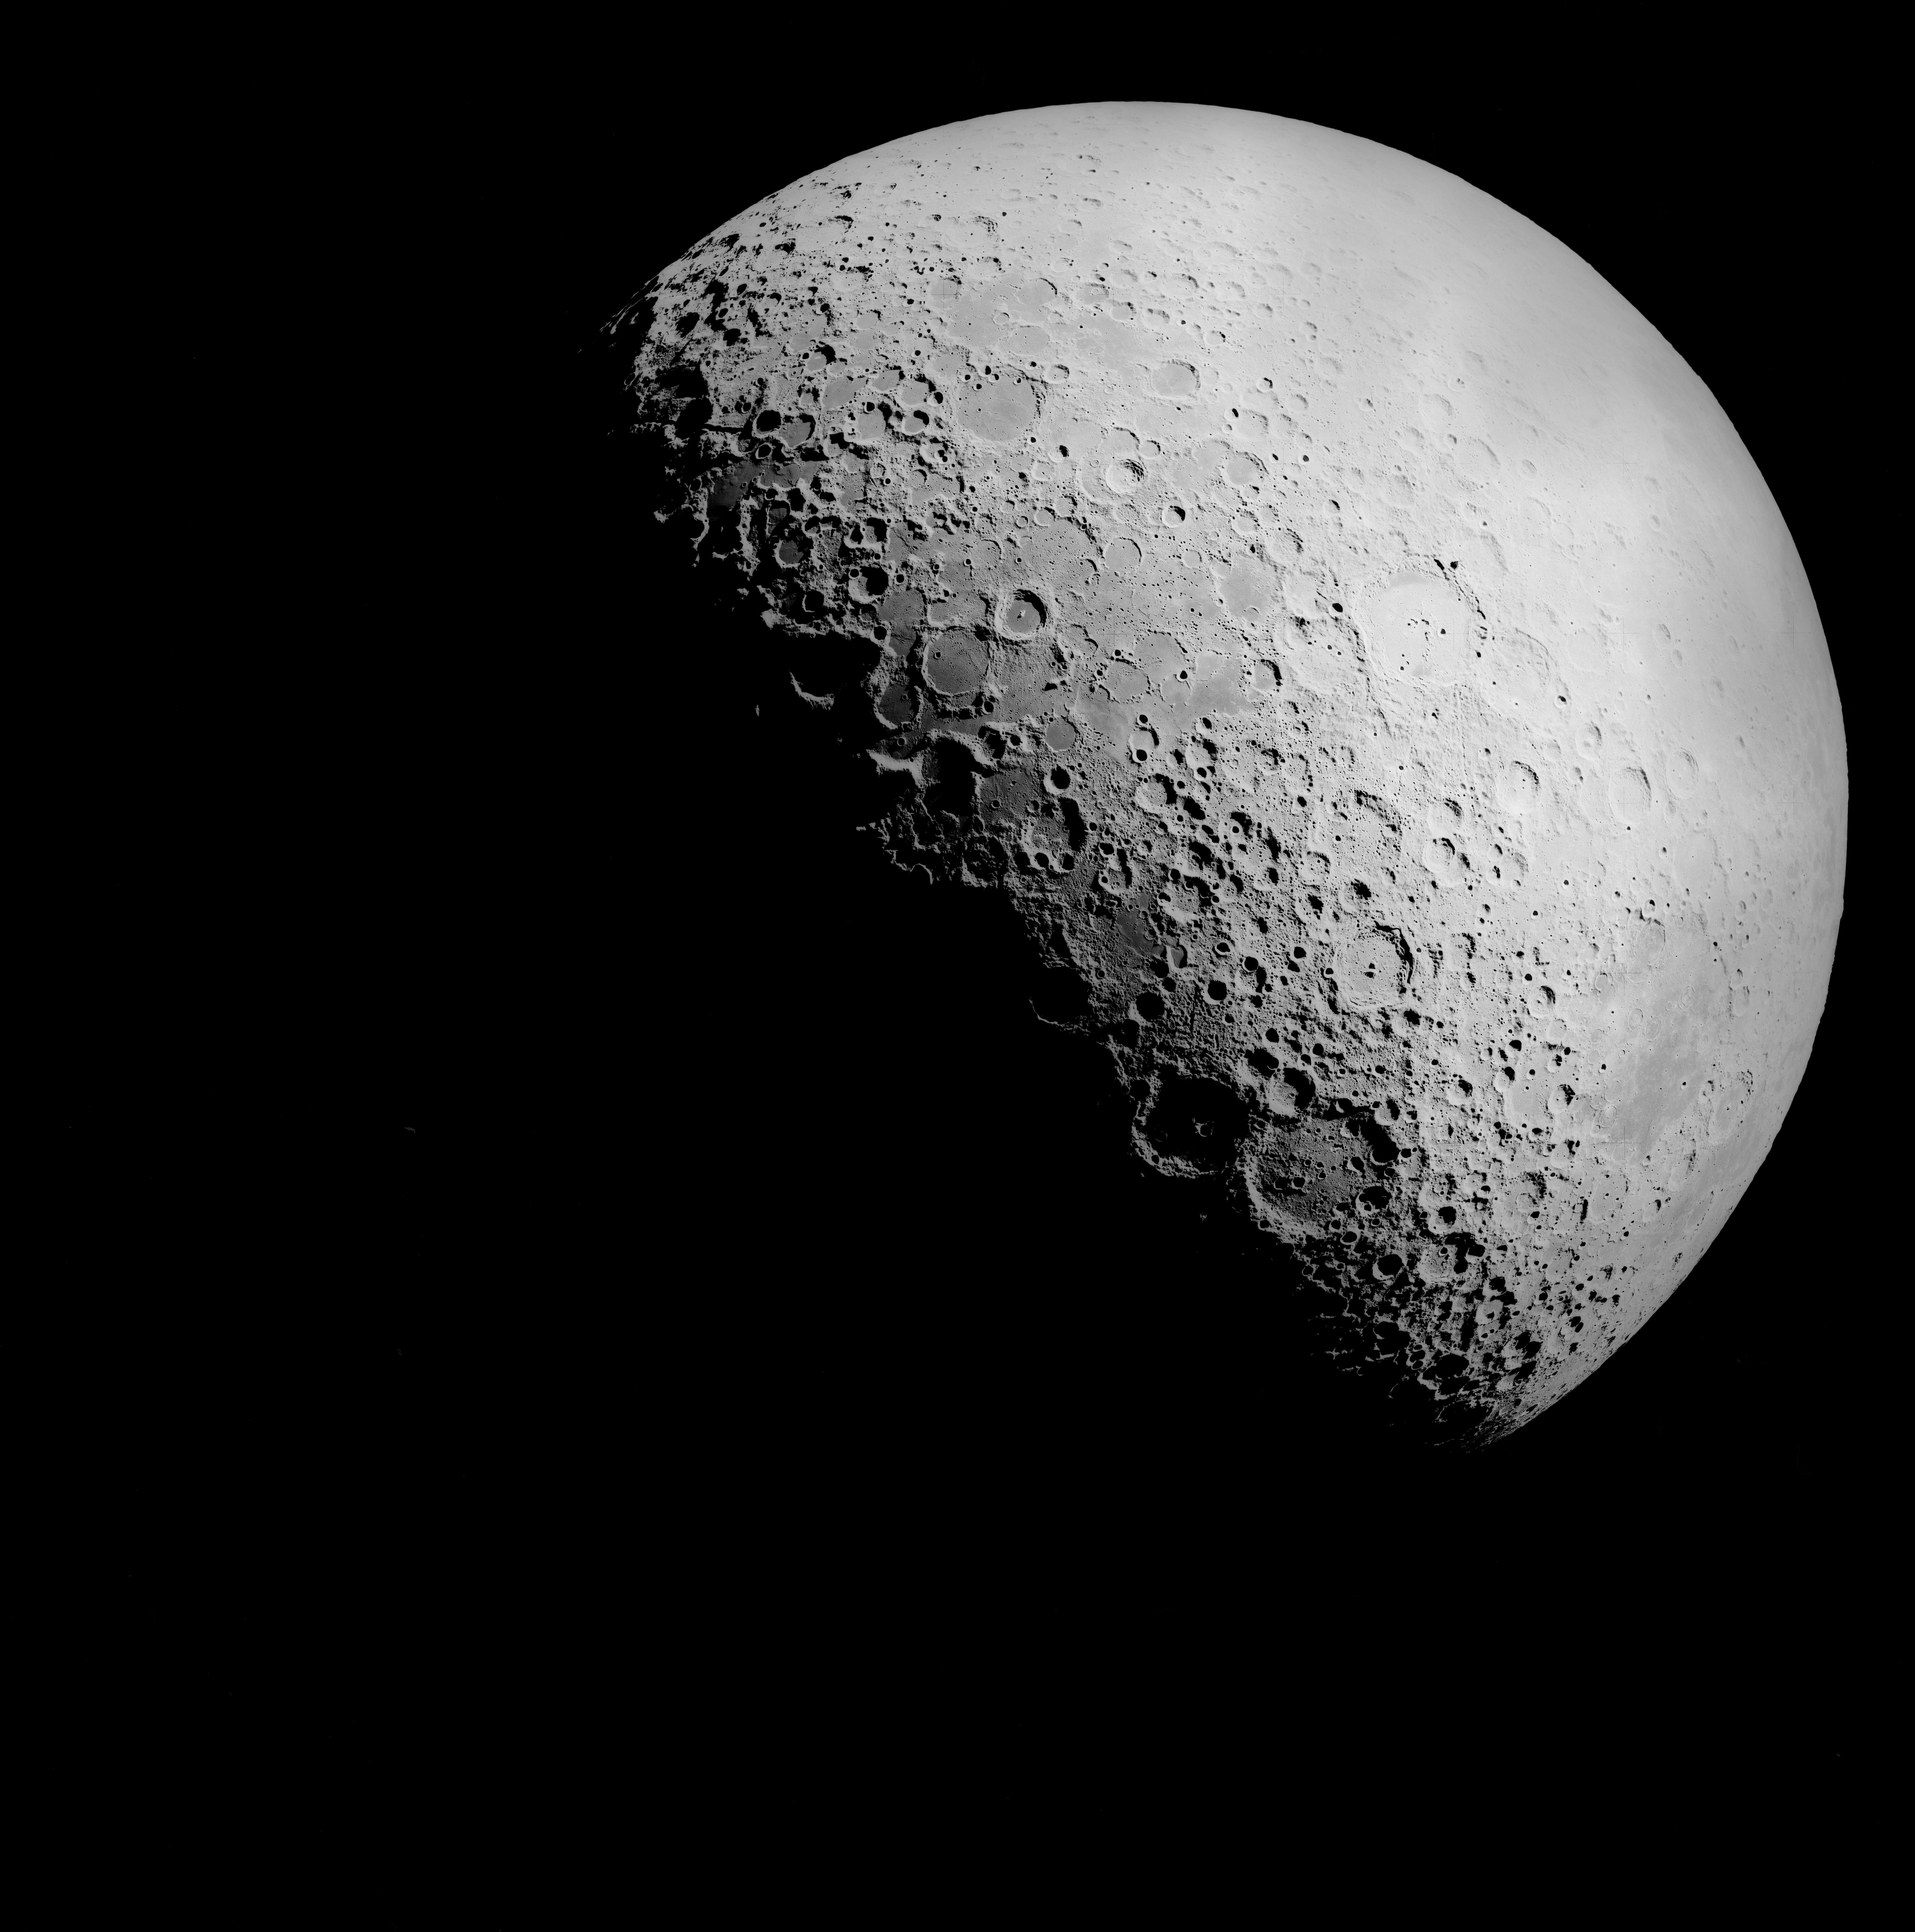 File:Moon AS15-M-2778.jpg - Wikimedia Commons